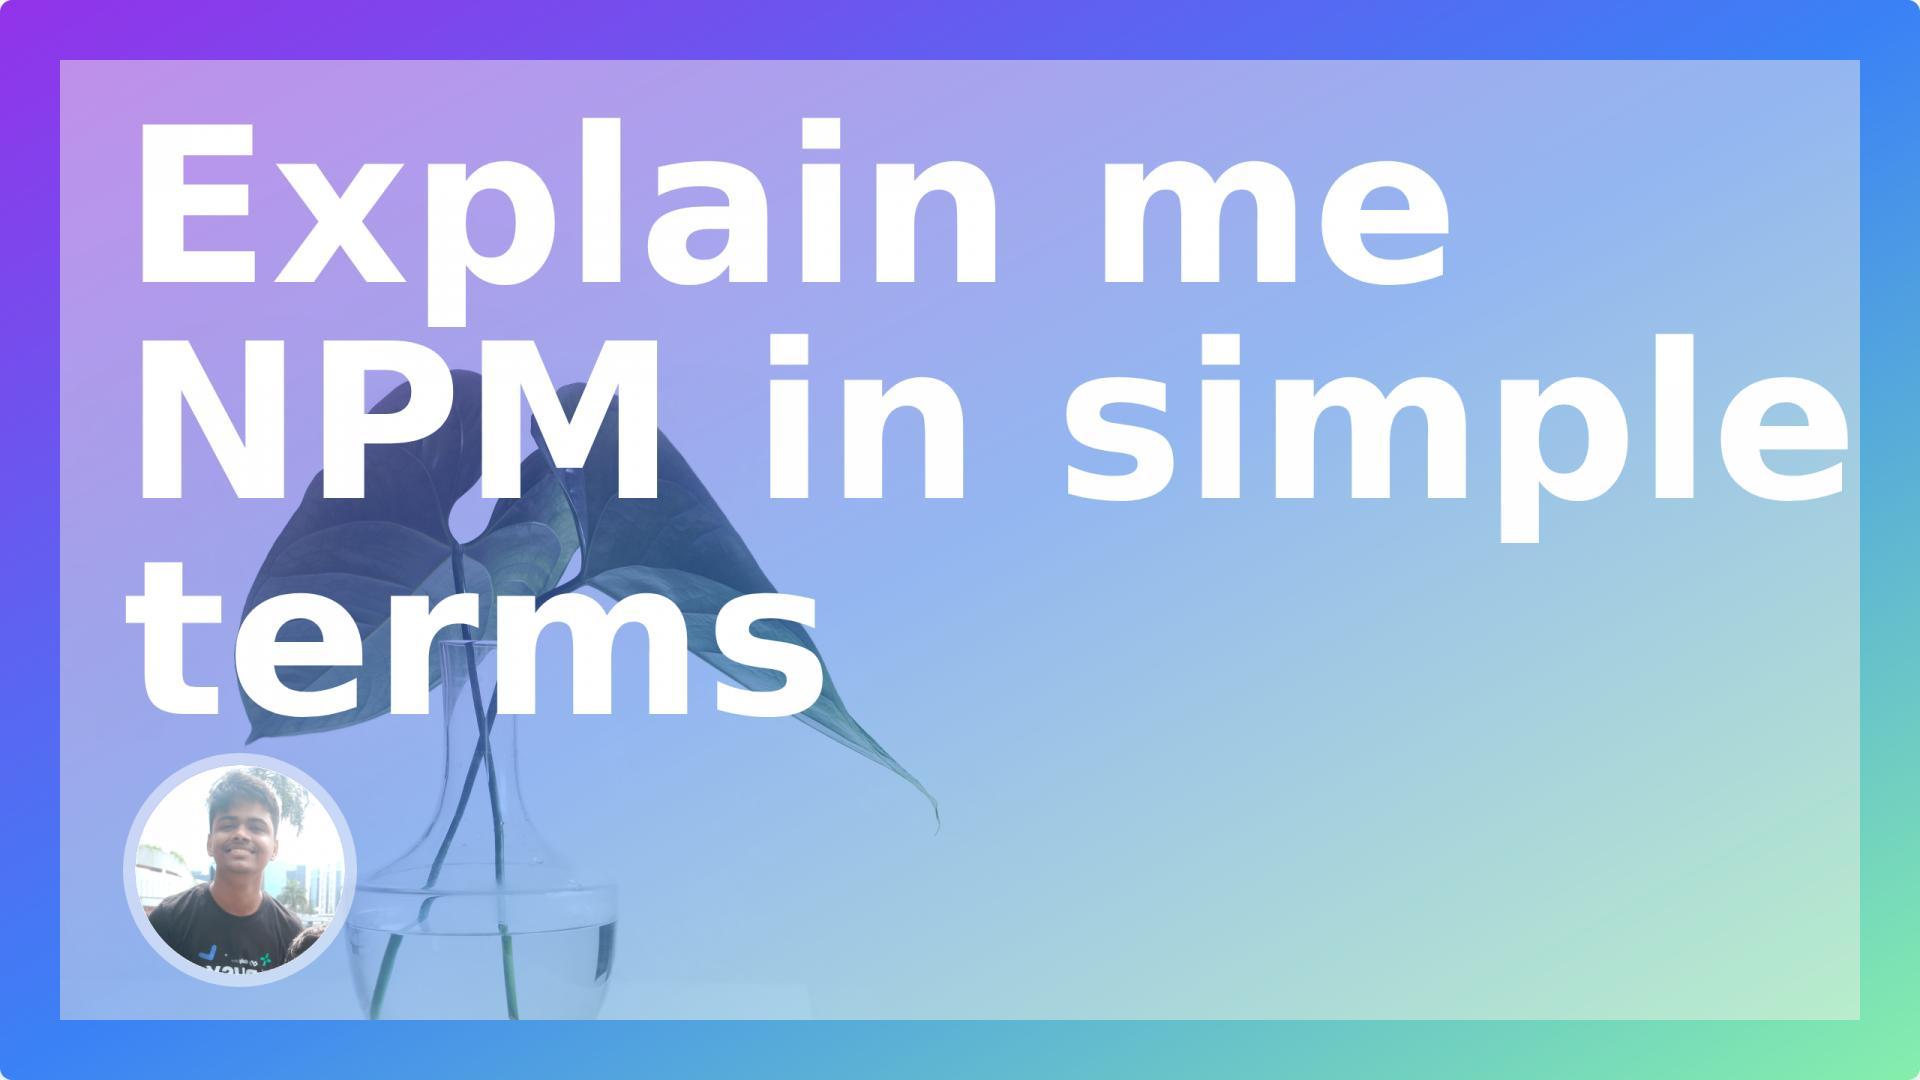 Explain me NPM in simple terms